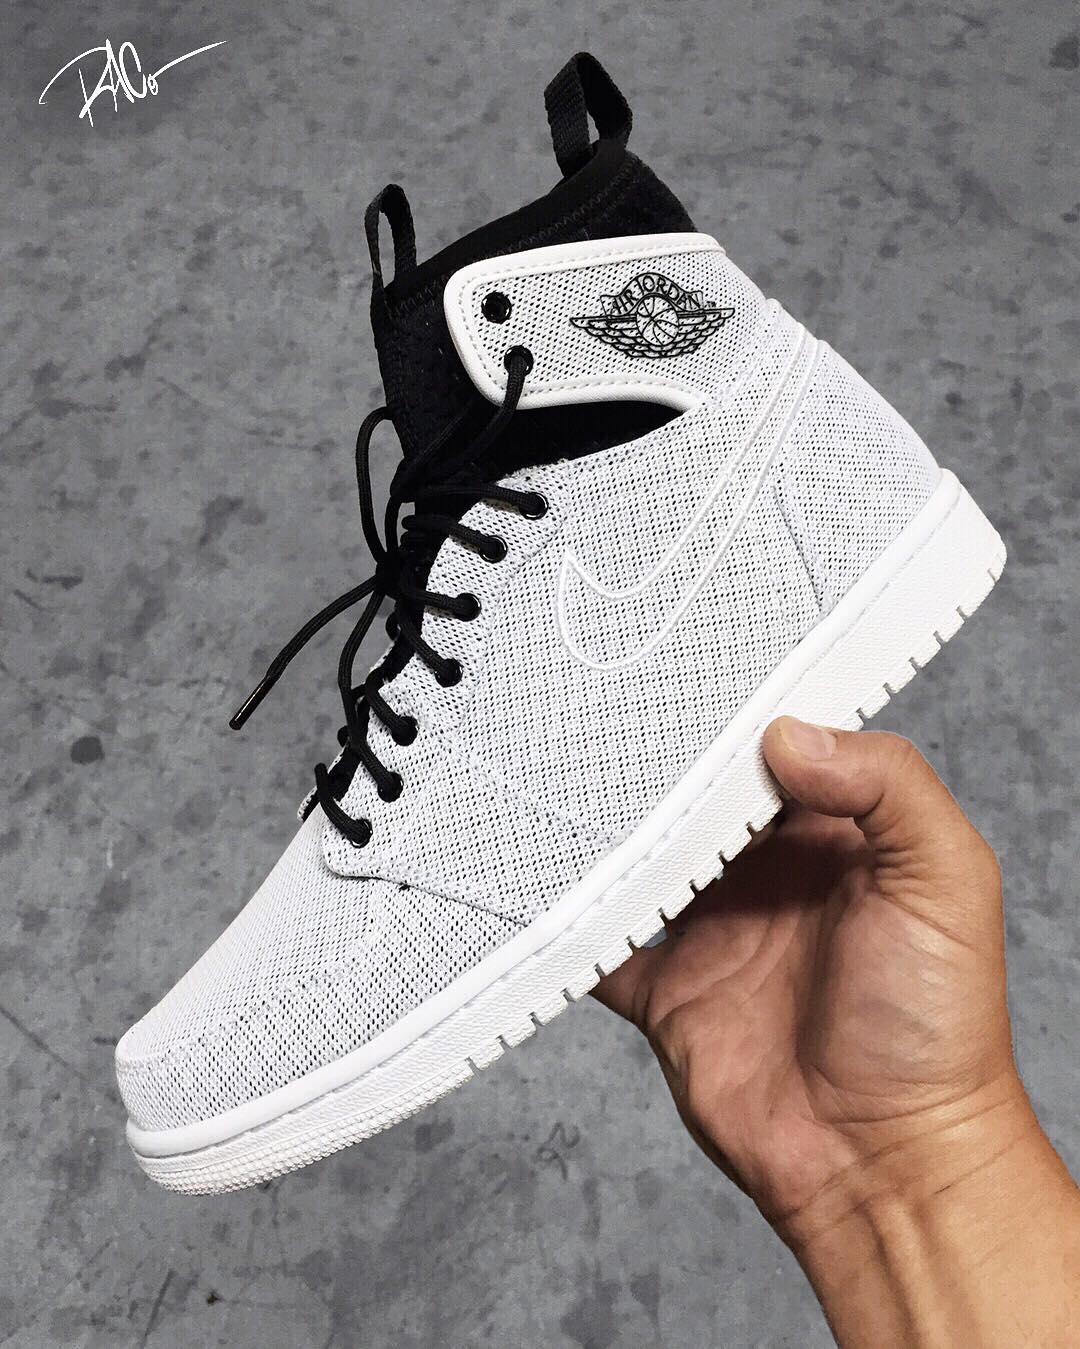 more photos ebc3c 8cbc3 Jordan Brand Adds Sleeve Design to the Air Jordan 1 - EU Kicks  Sneaker  Magazine